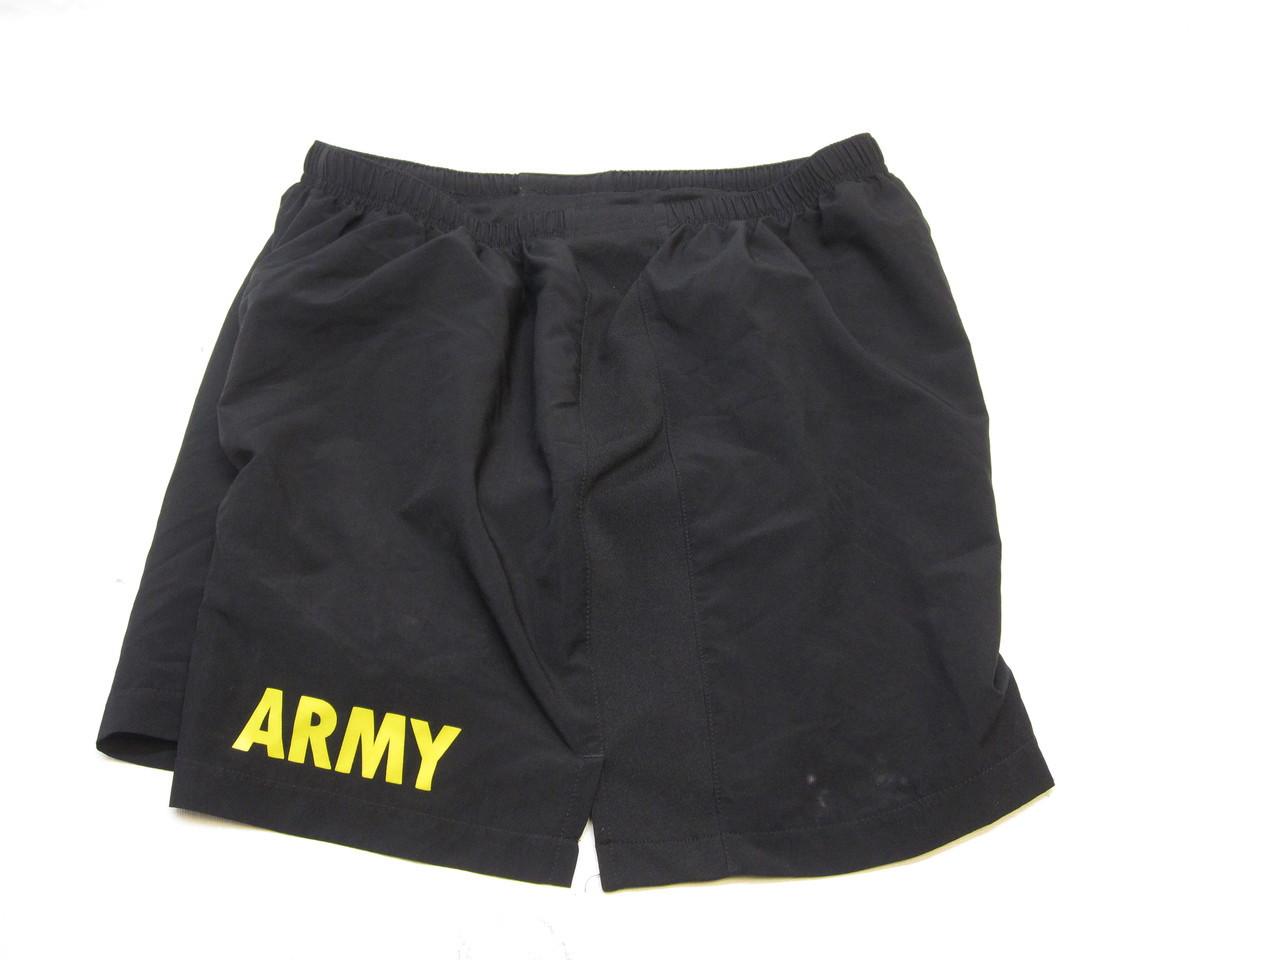 US ARMY PT SHORTS PHYSICAL TRAINING GYM SHORT SWIM TRUNKS LARGE b3